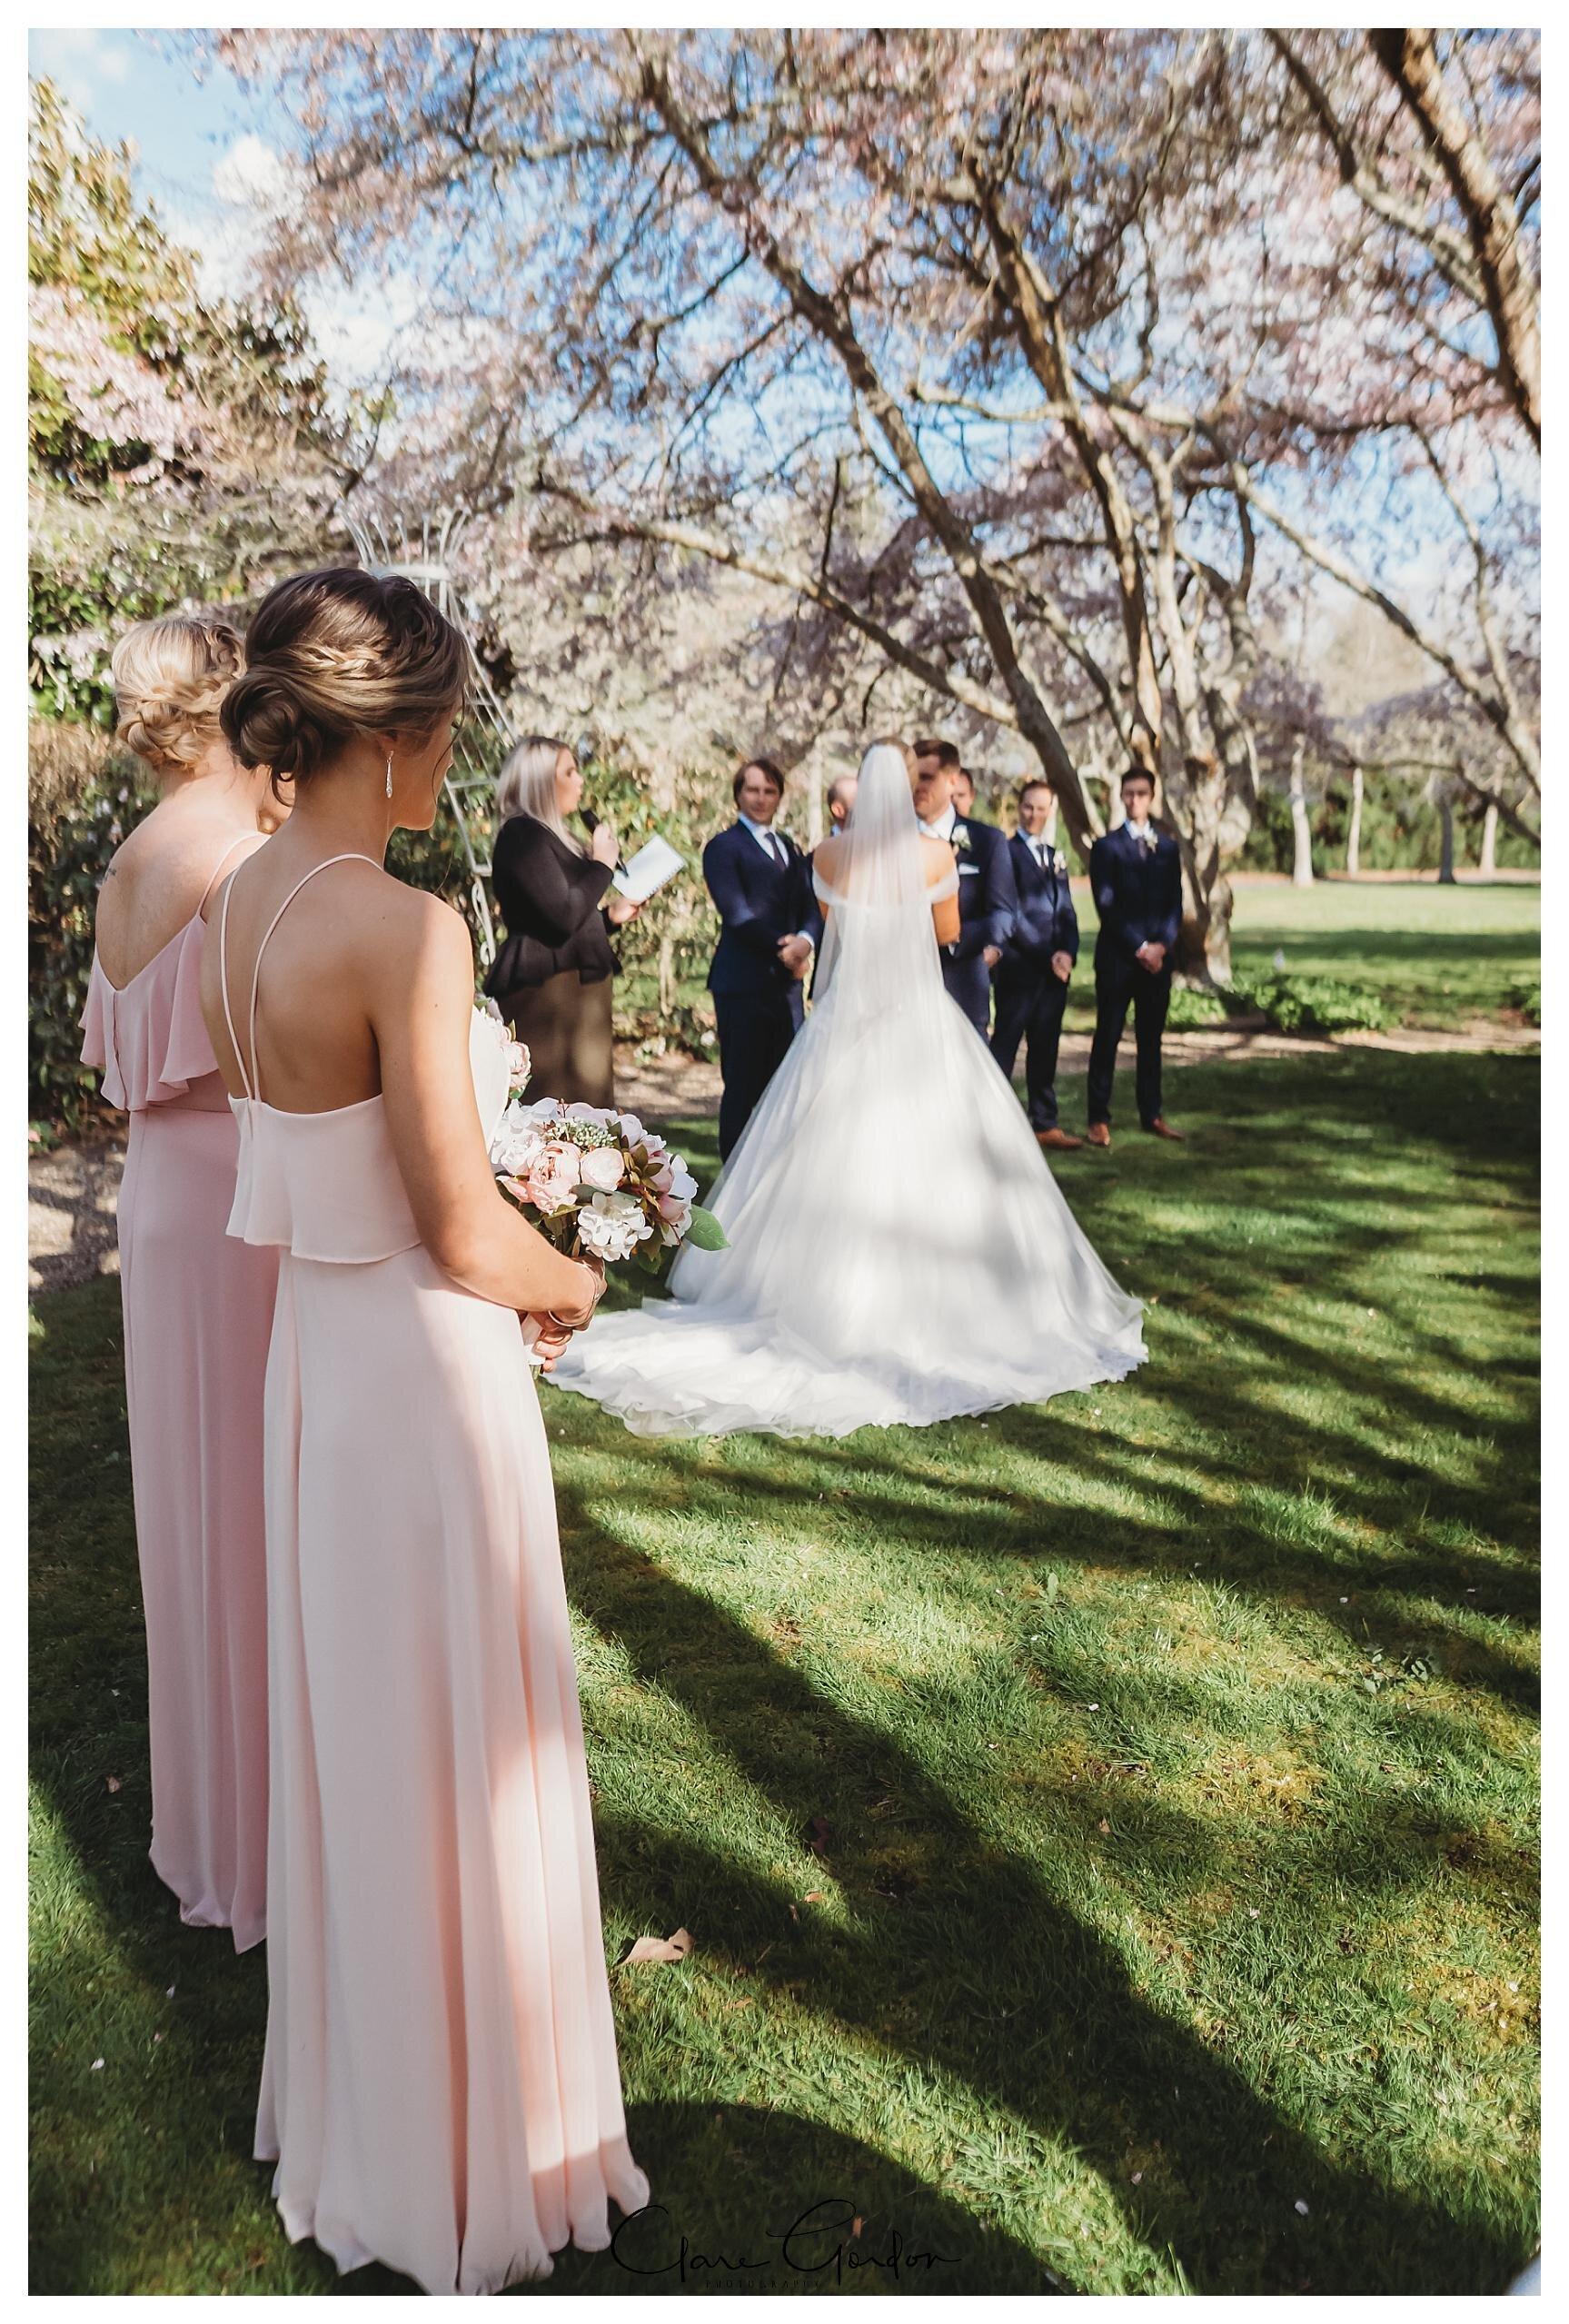 Henley-Hotel-Cherry-blossom-wedding-photos (47).jpg